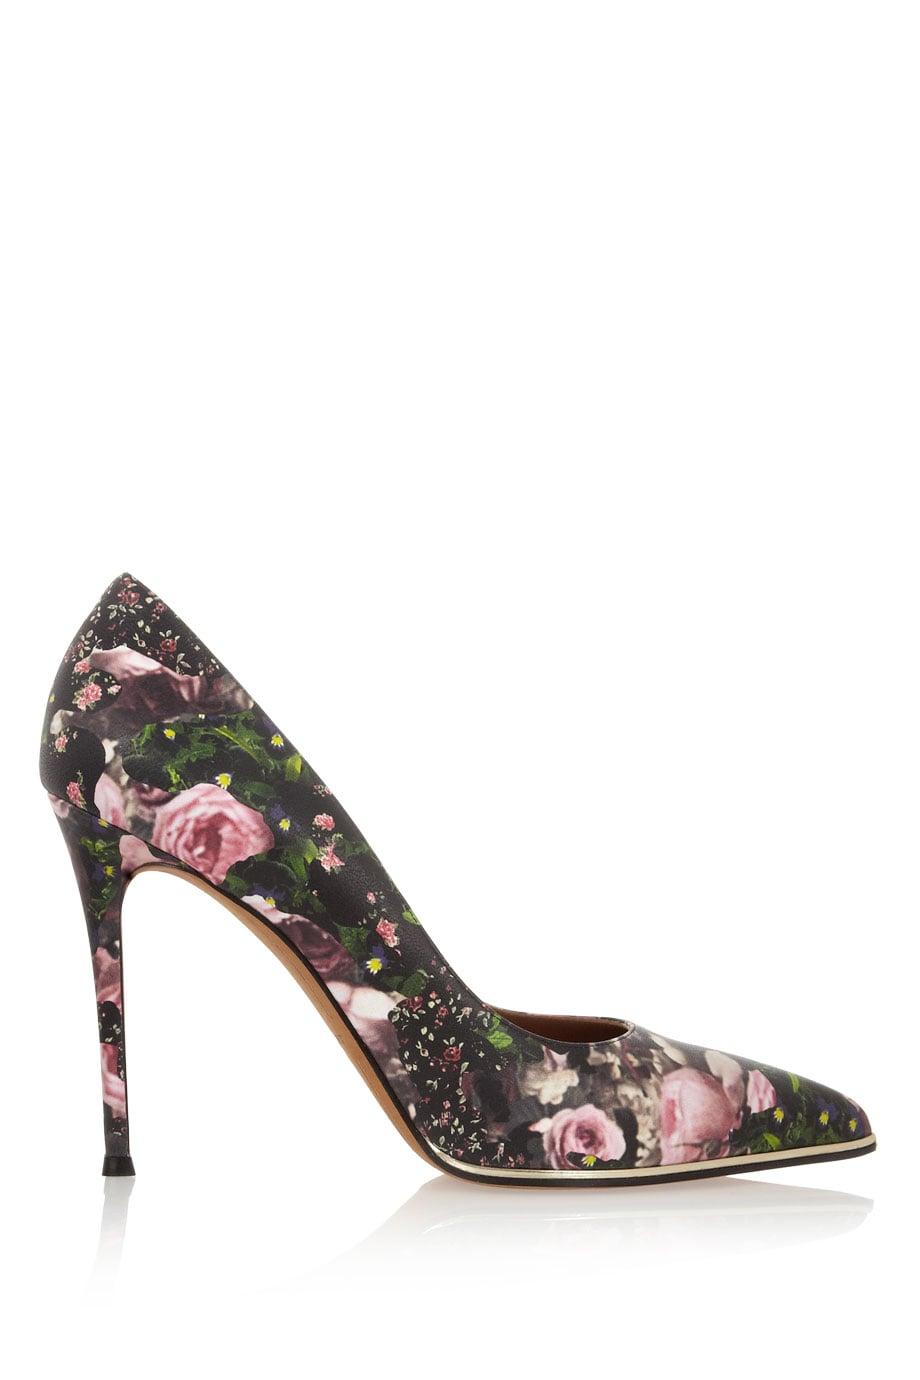 Givenchy Floral-Print Pumps